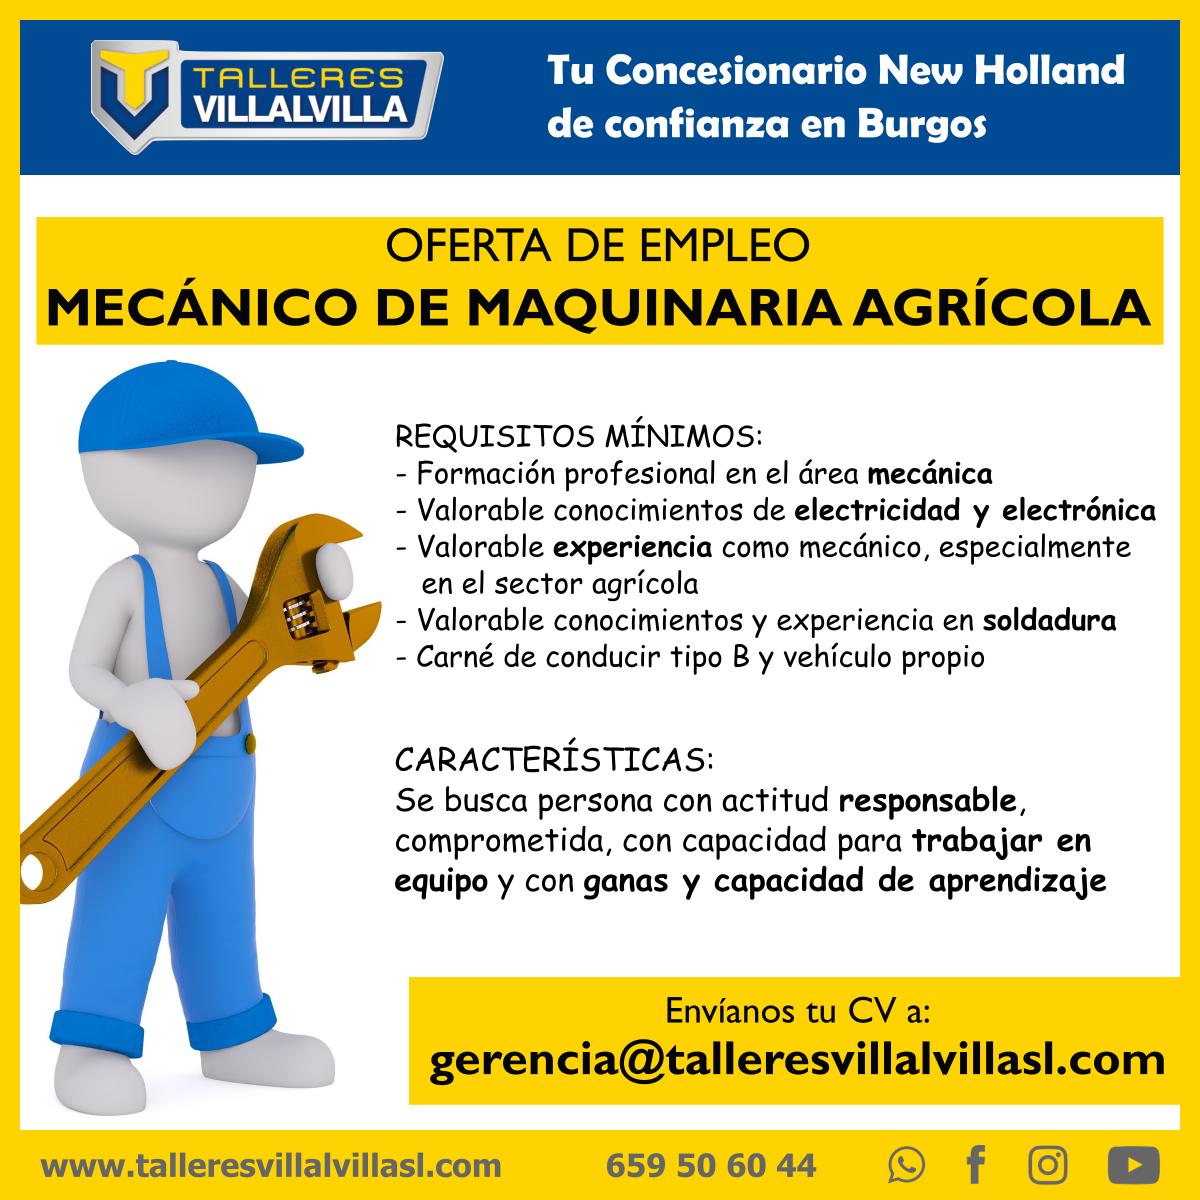 OFERTA DE EMPLEO | MECÁNICO DE MAQUINARIA AGRÍCOLA